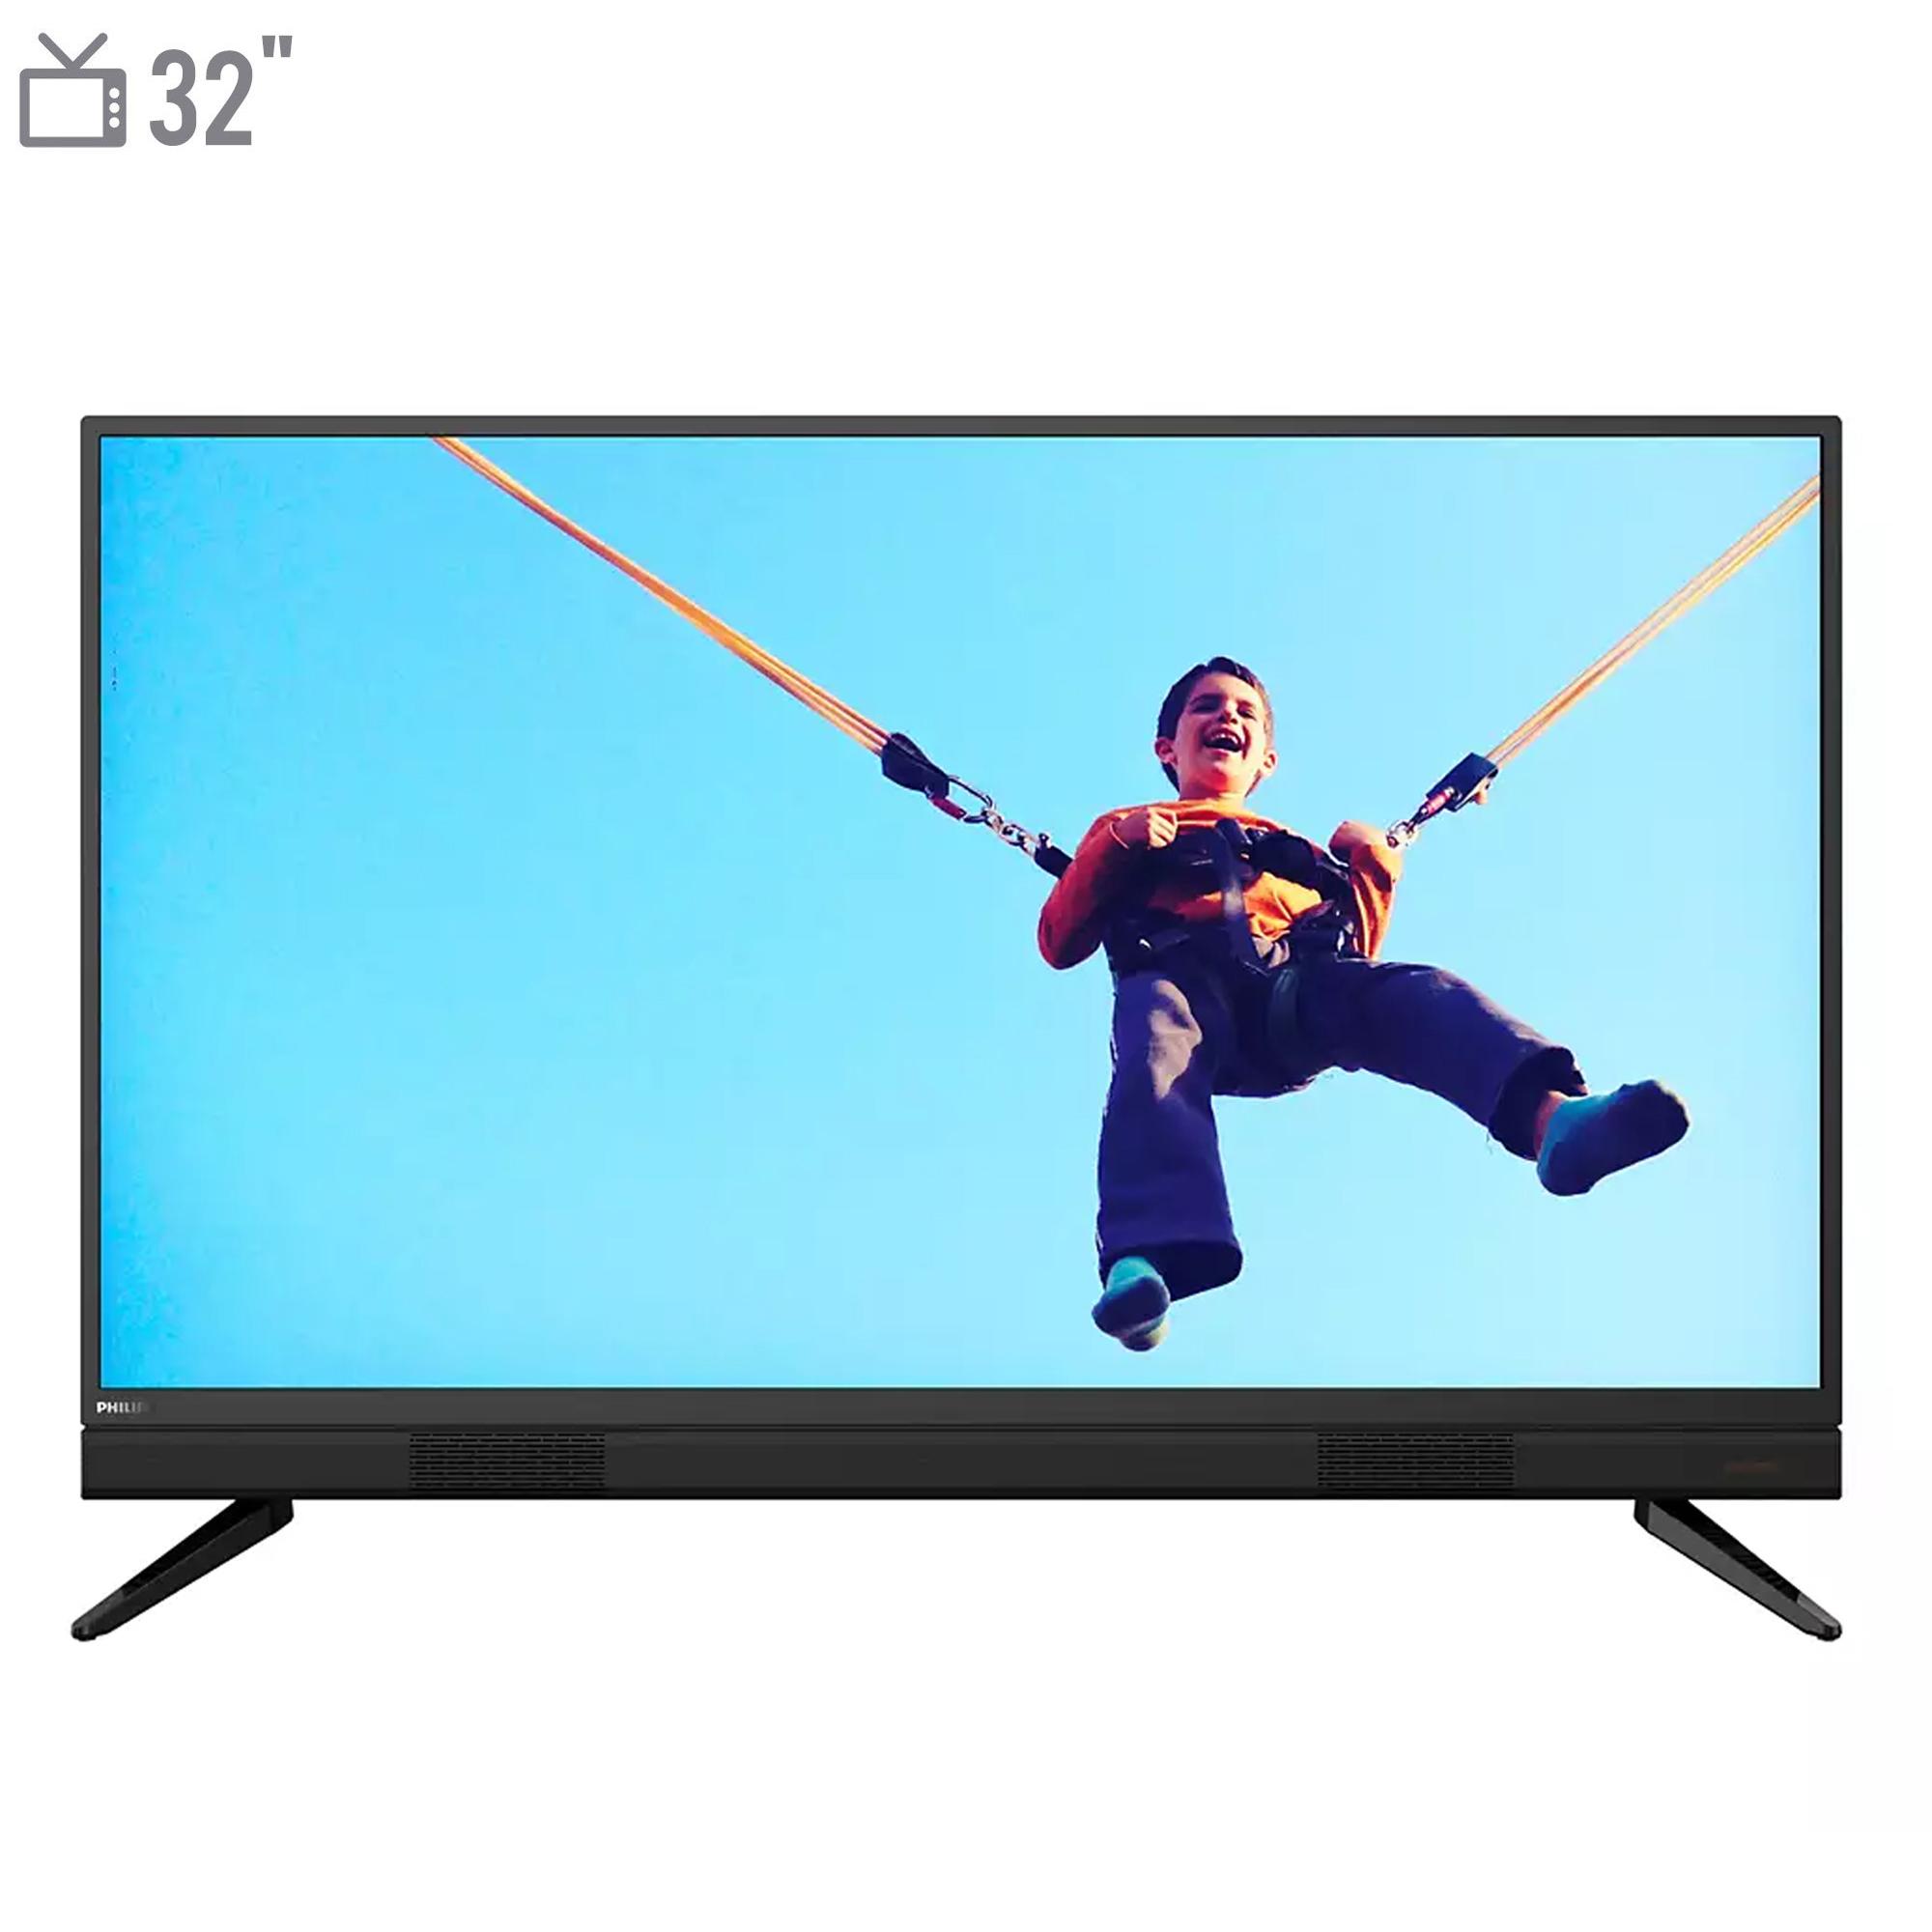 فروش نقدی و اقساطی تلویزیون ال ای دی فیلیپس مدل 32PHT5583 سایز 32 اینچ